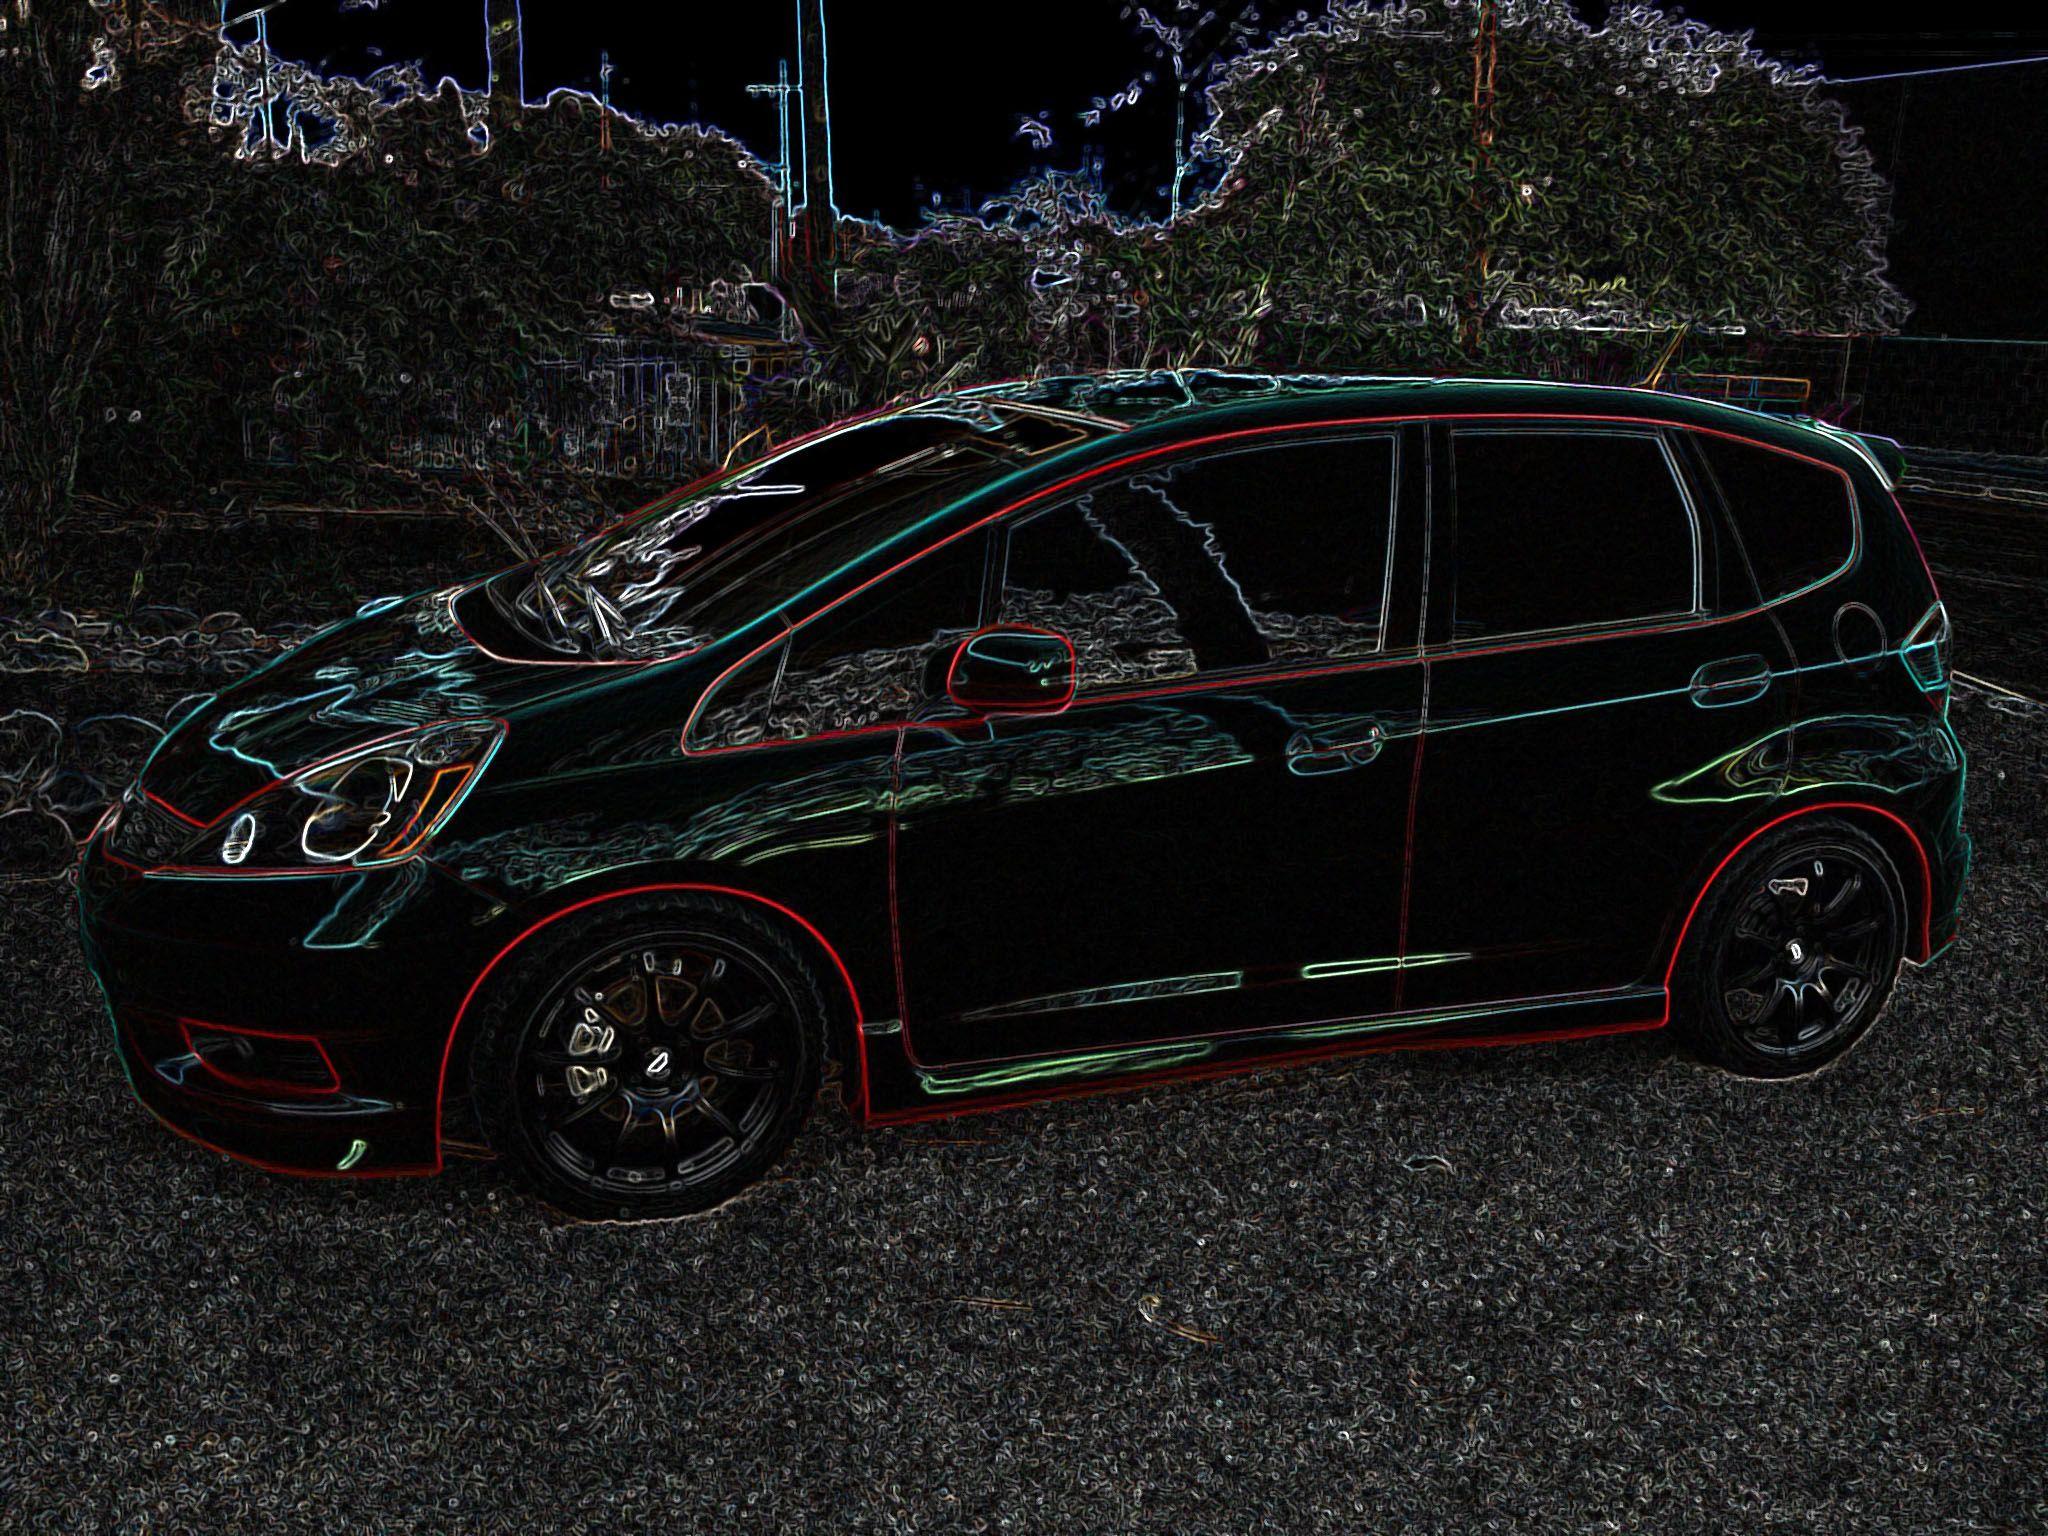 2013 Honda Fit Abstract  Formulajdm Com